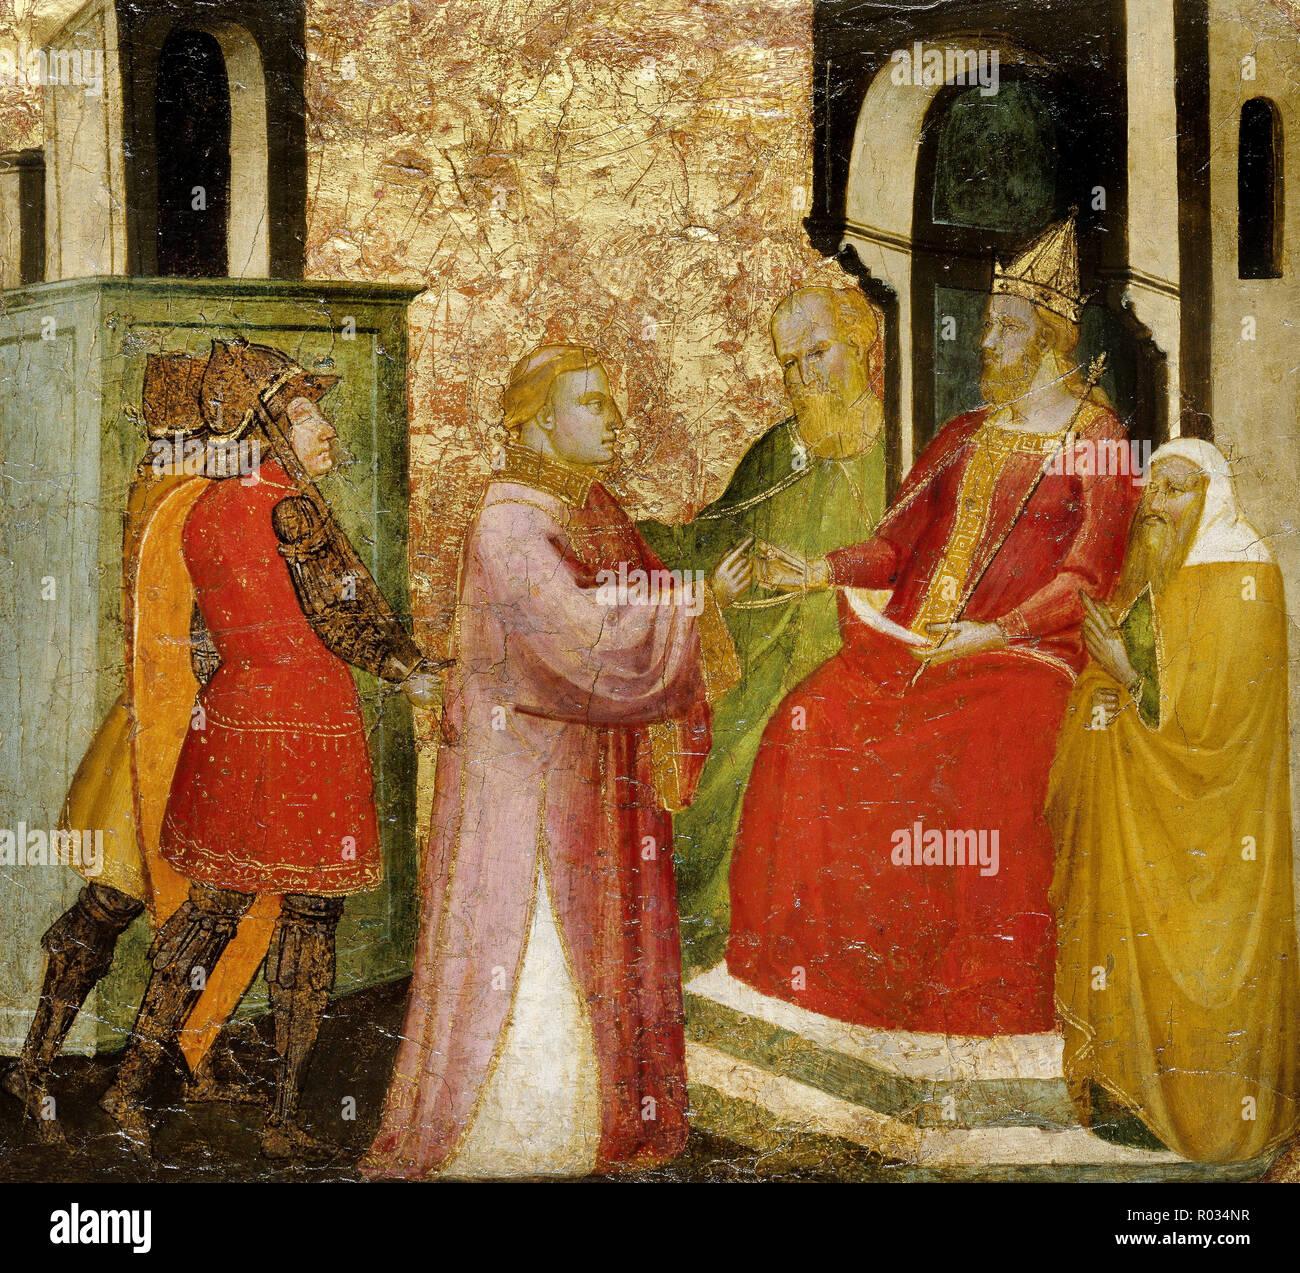 Lorenzo di Niccolo, Saint Lawrence Arraigned Before the Prefect Valerianus, Circa 1412, Tempera and tooled gold on poplar panel, Brooklyn Museum, New York City, USA. - Stock Image